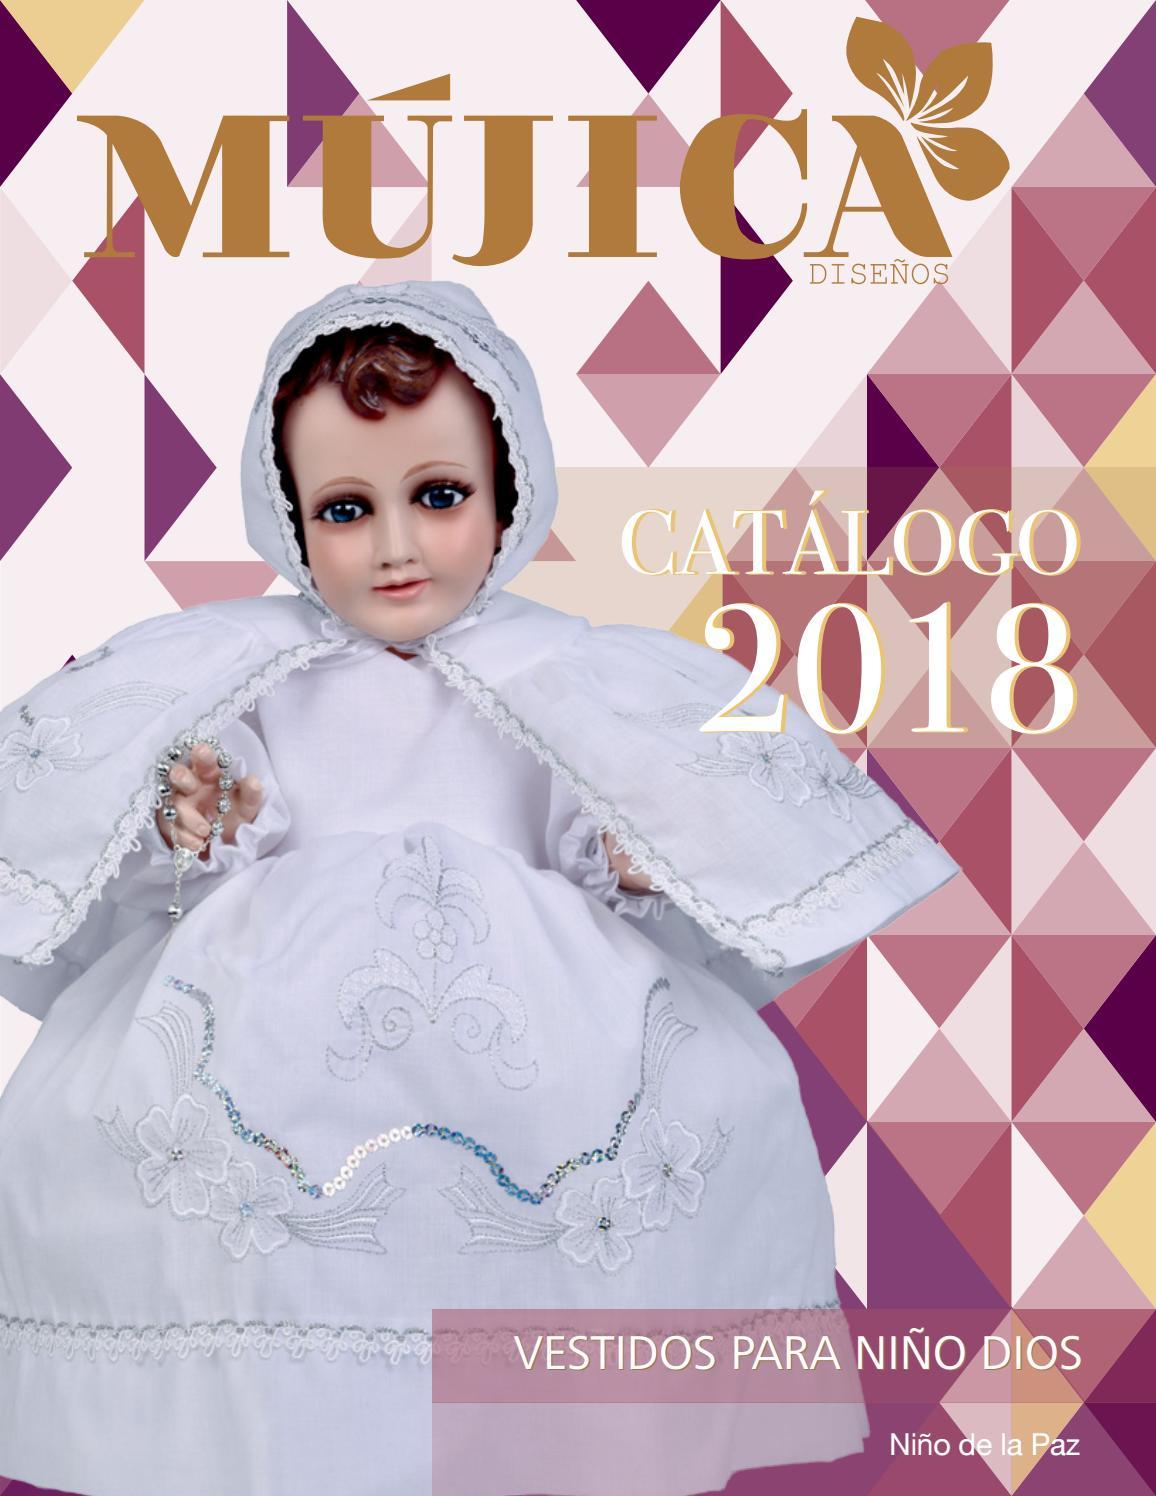 Mujica Catálogo 2018 By Patrickcastrejon Issuu